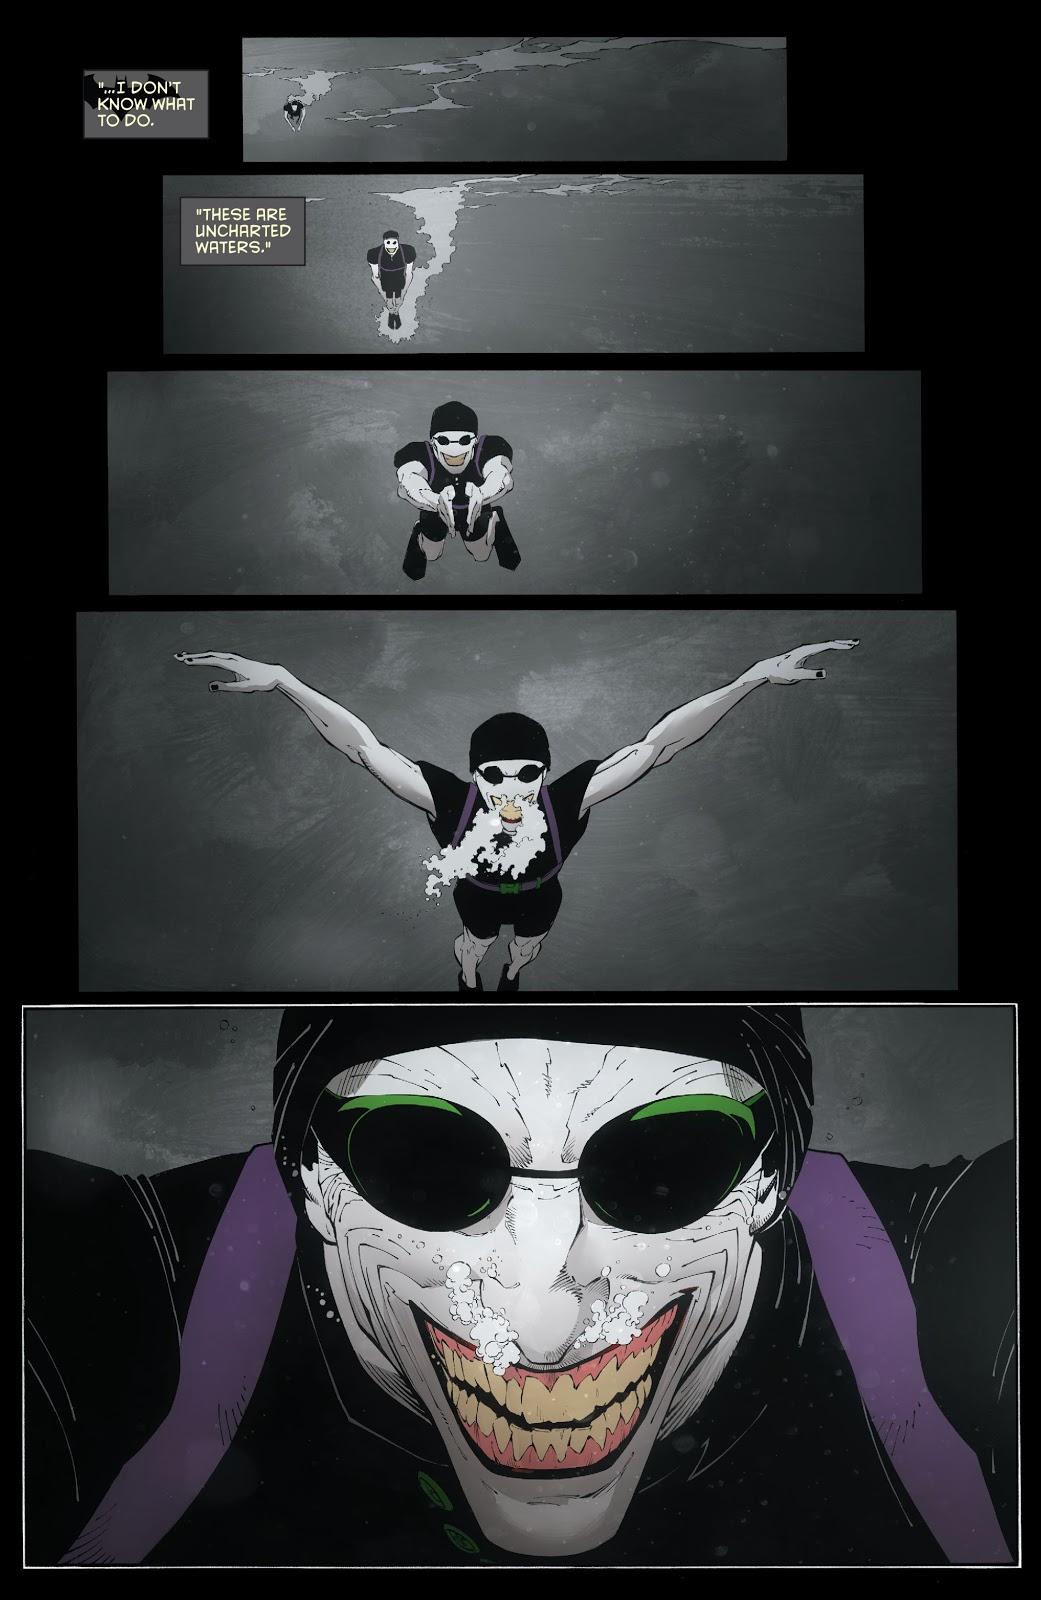 The Joker (Batman Vol. 2 #38)